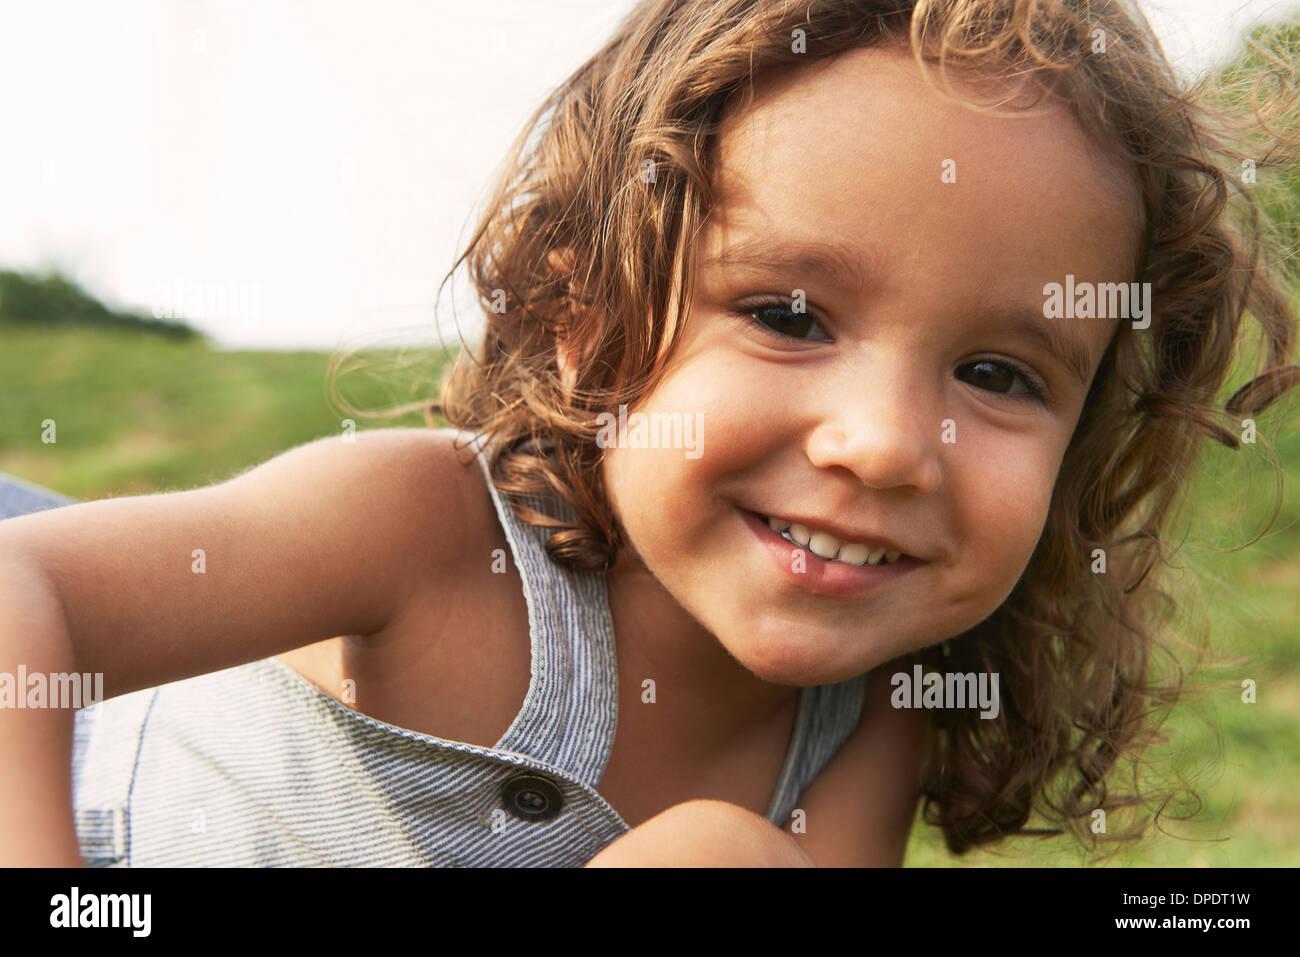 Retrato de joven con pelo castaño, sonriendo Imagen De Stock